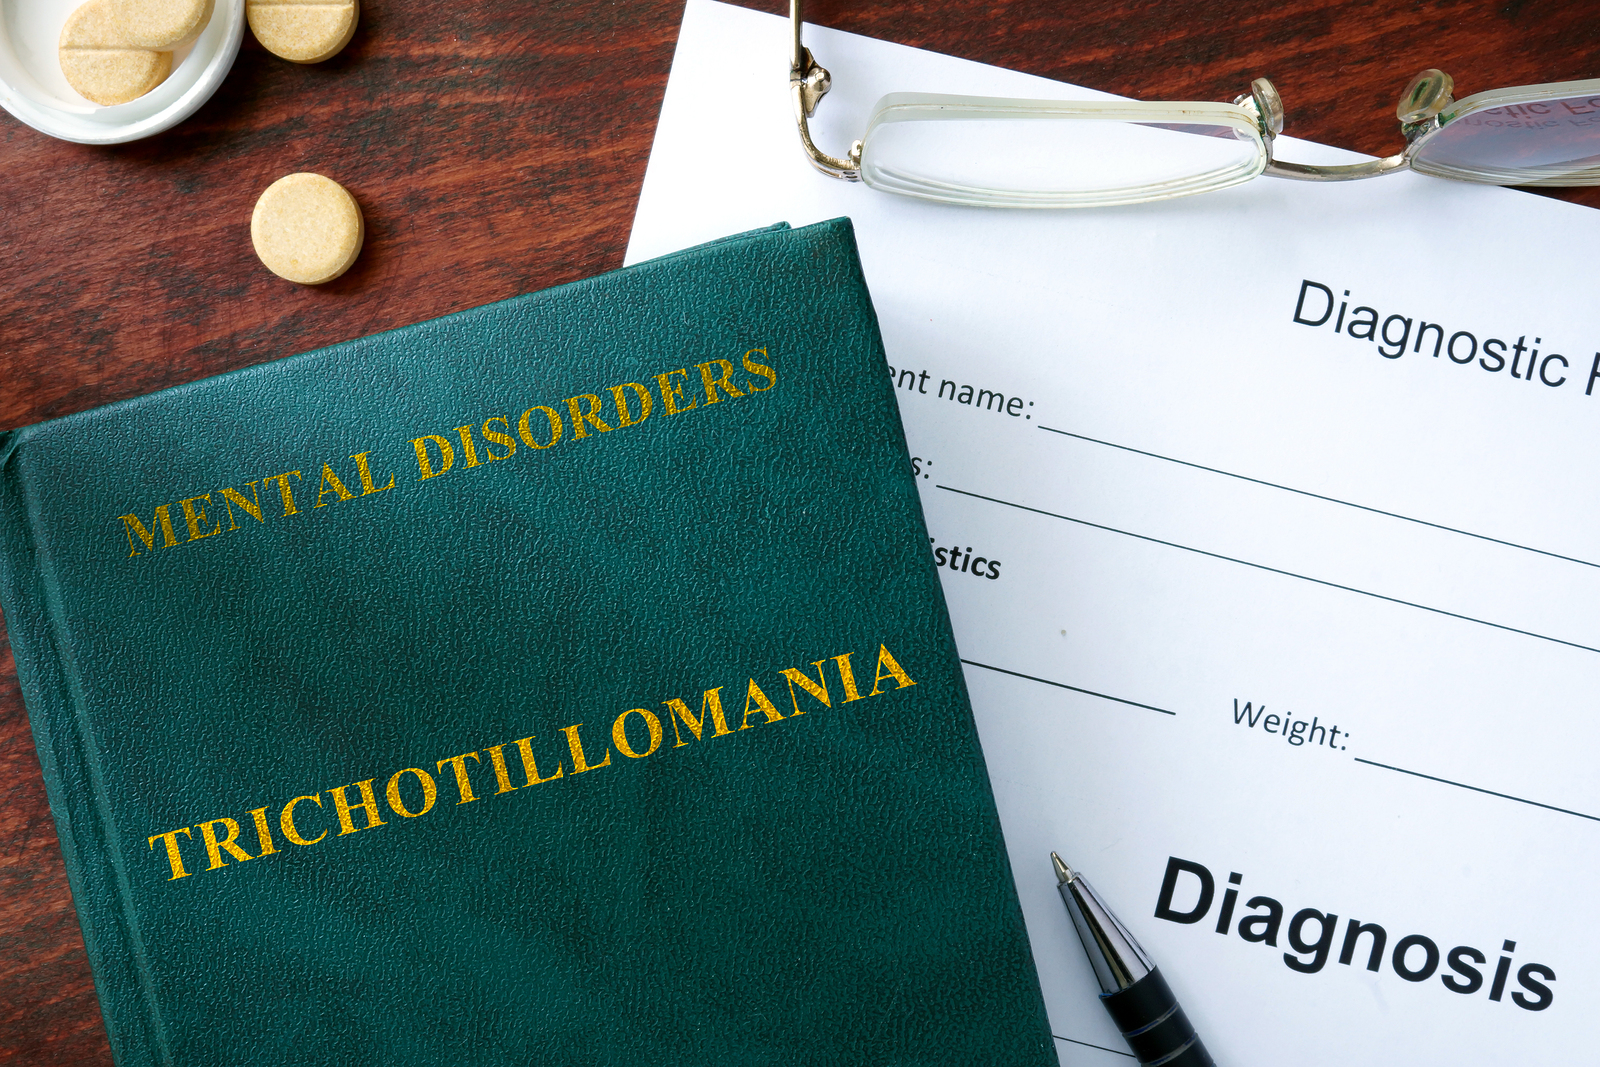 Trichotillomania and Marijuana Information: Treat Trichotillomania With Cannabis